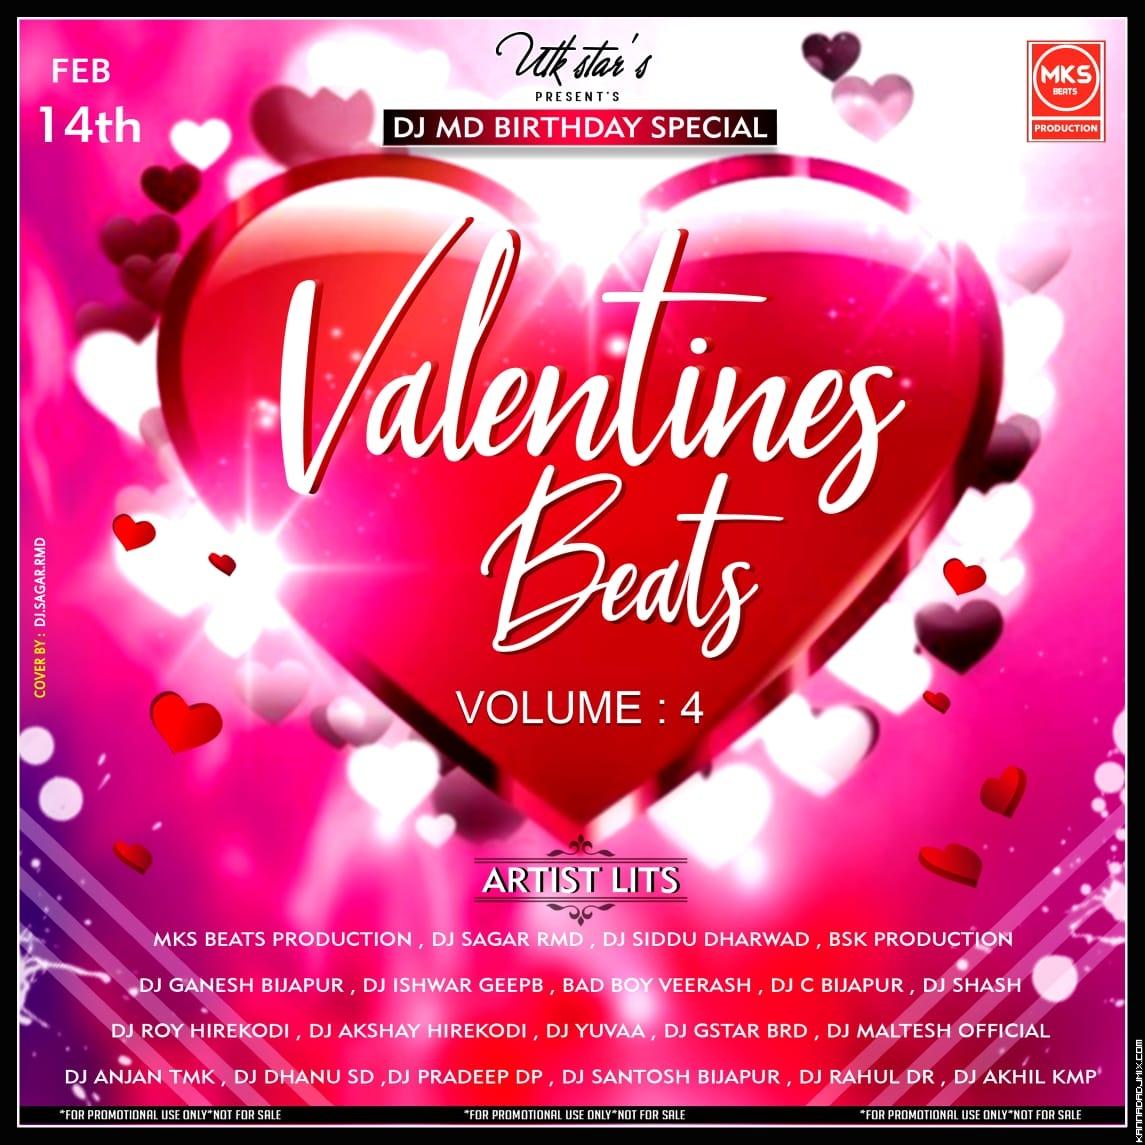 VALENTINE's BEAT's VOL-04